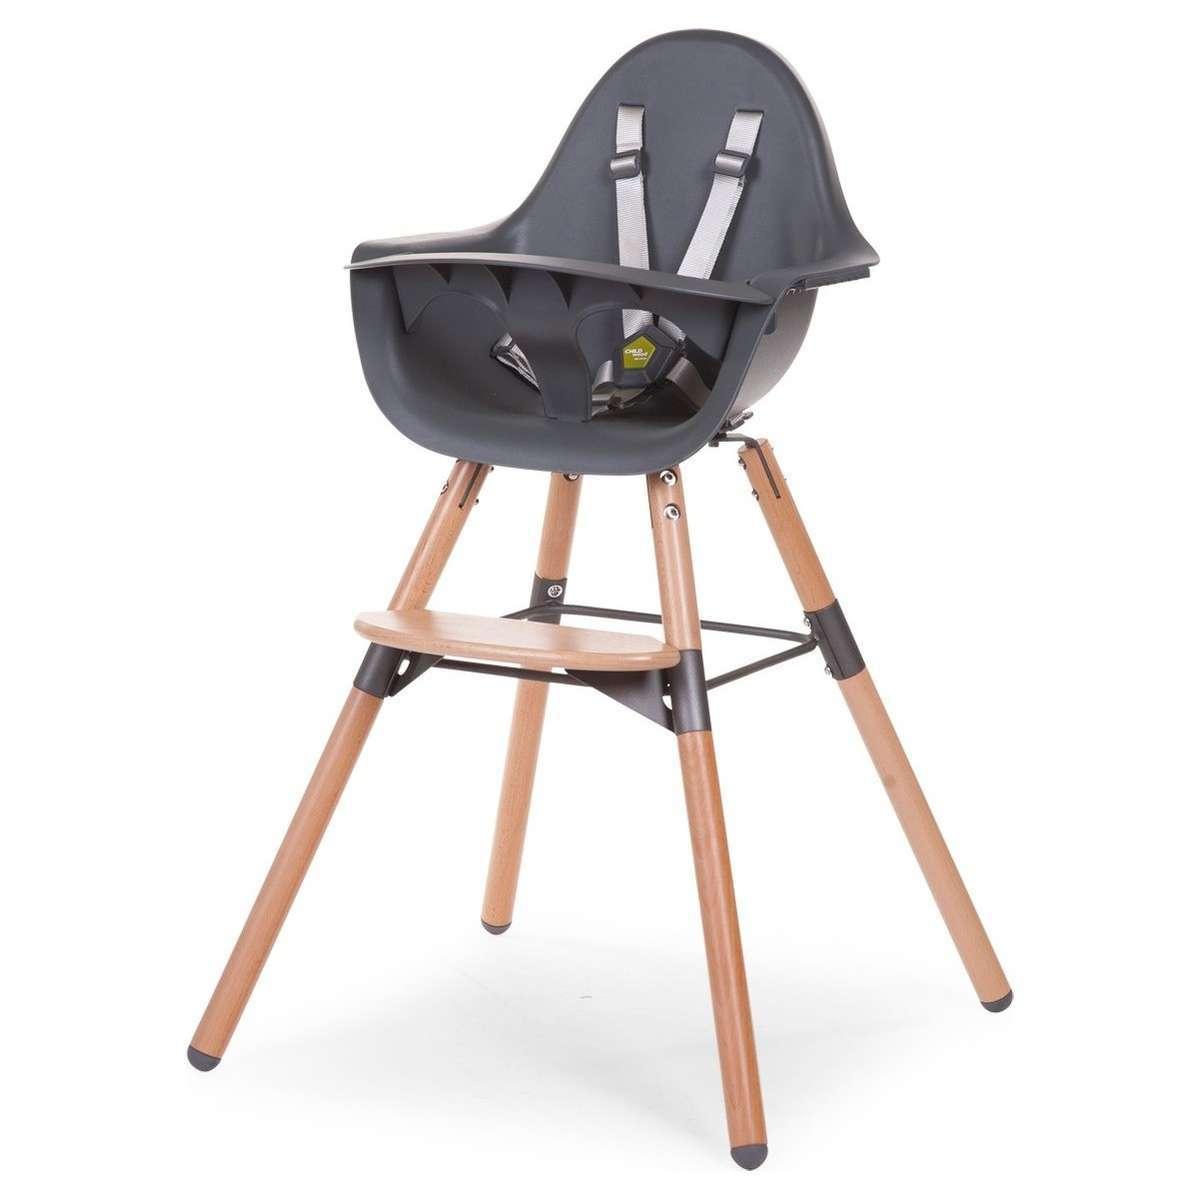 chaise haute chaise haute evolu 2 pieds bois anthracite chaise haute evolu 2 pieds bois